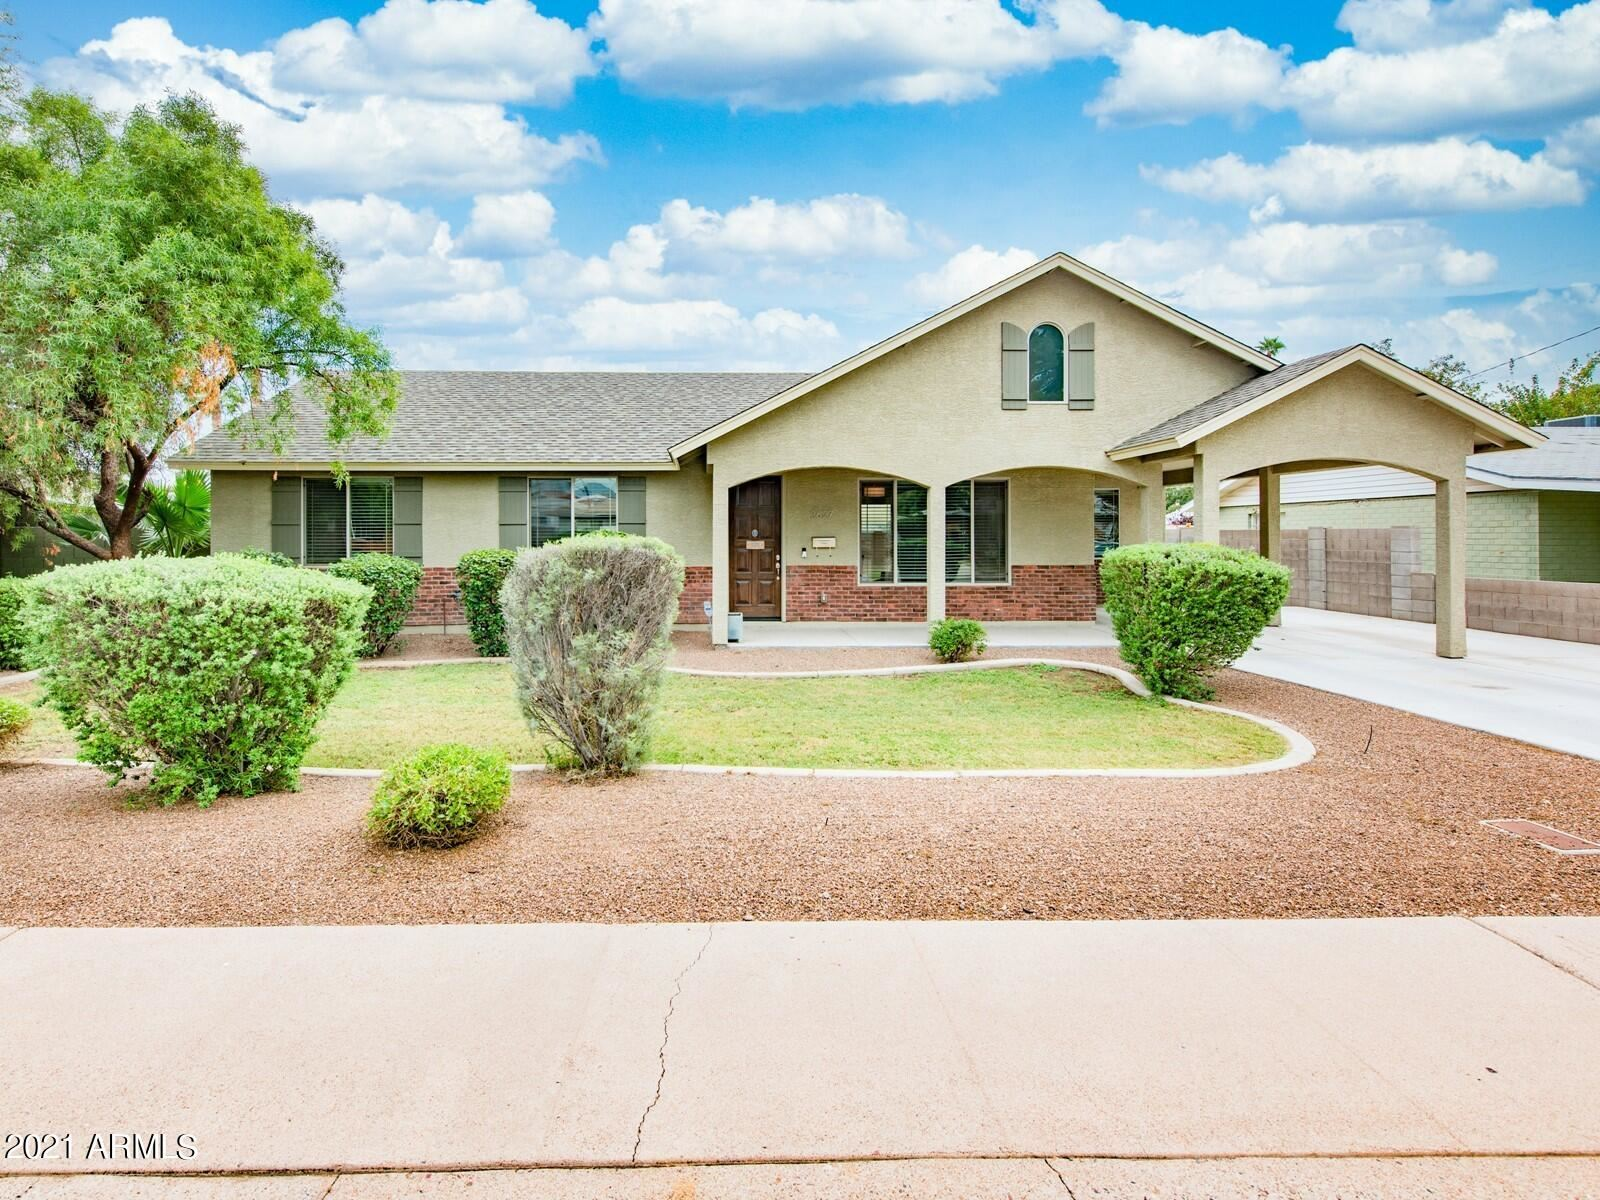 3627 E PICCADILLY Road, Phoenix, AZ 85018 - MLS#: 6299484